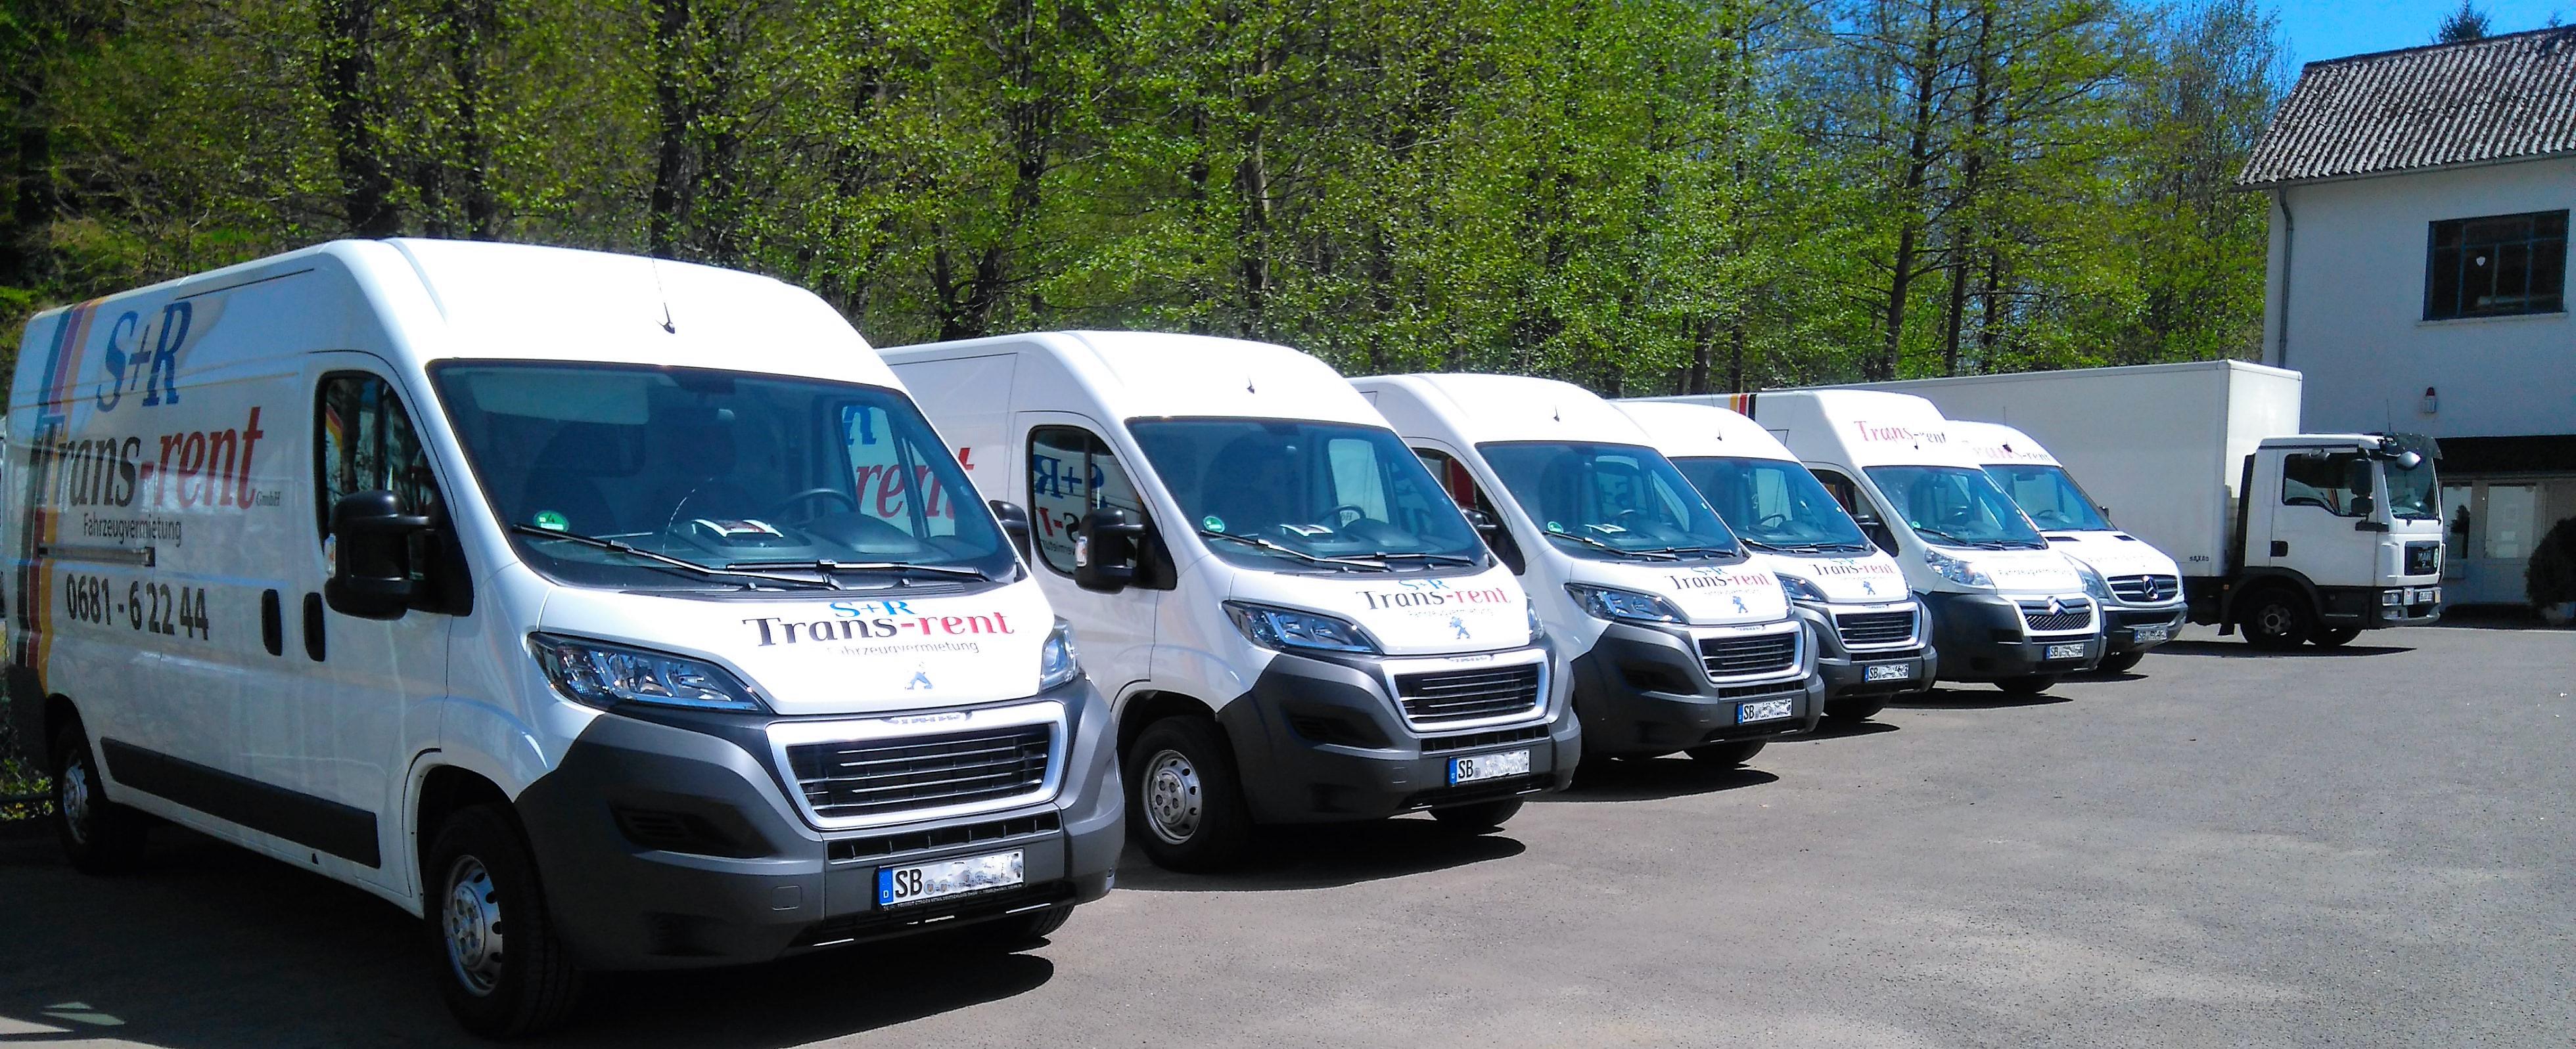 S+R Trans-rent Fahrzeugvermietung GmbH